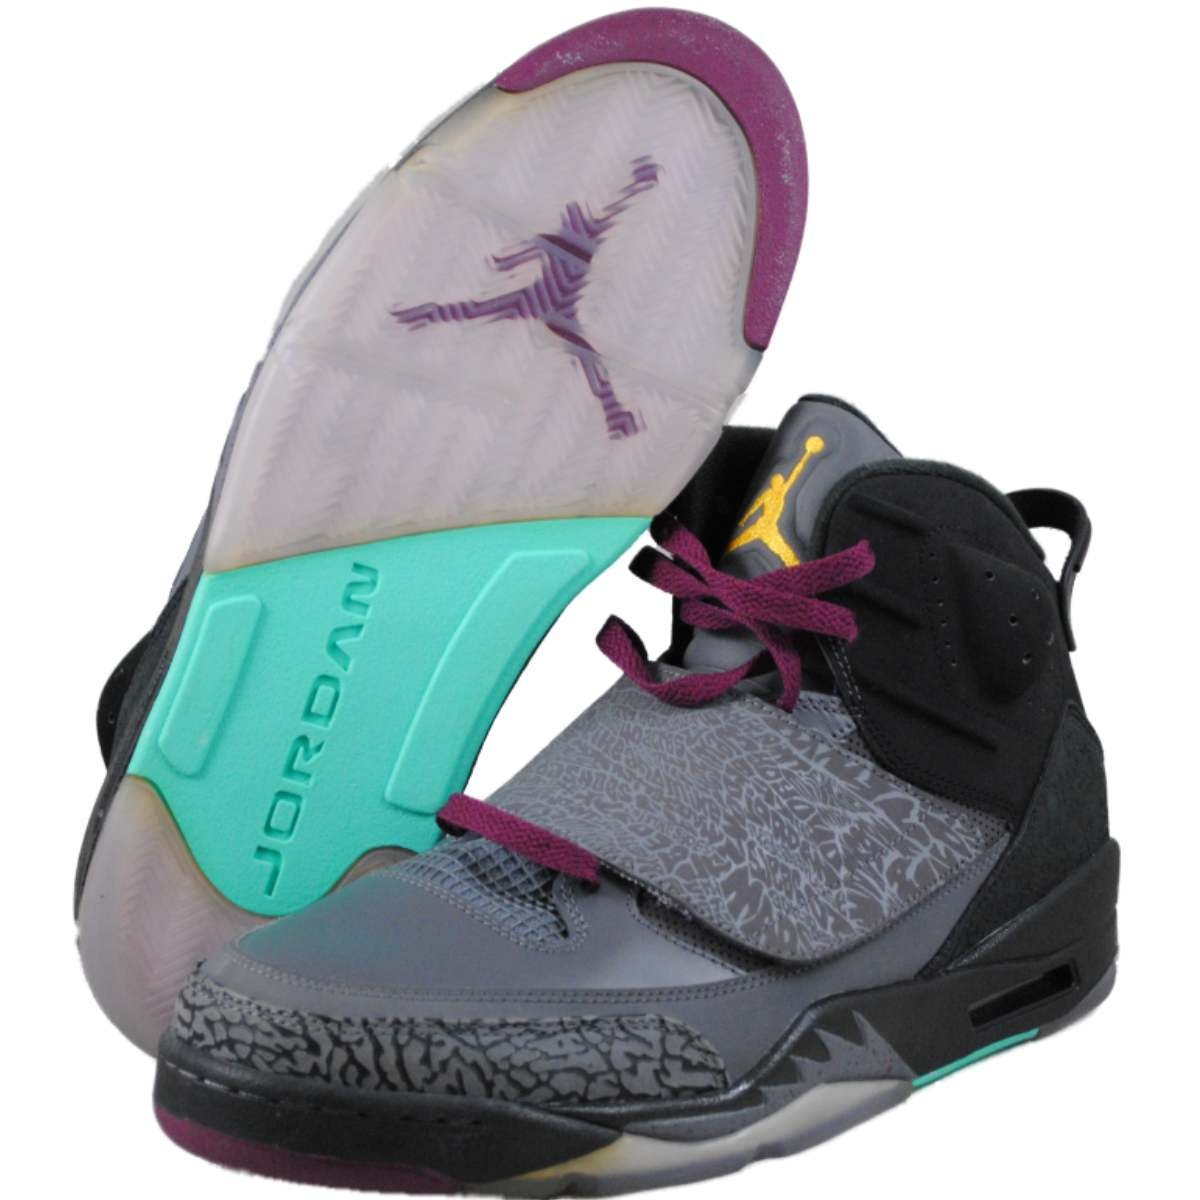 100% authentic 5c956 3db53 Amazon.com   Jordan Nike Air Son Of Mars Mens Basketball Shoes 512245-038    Basketball